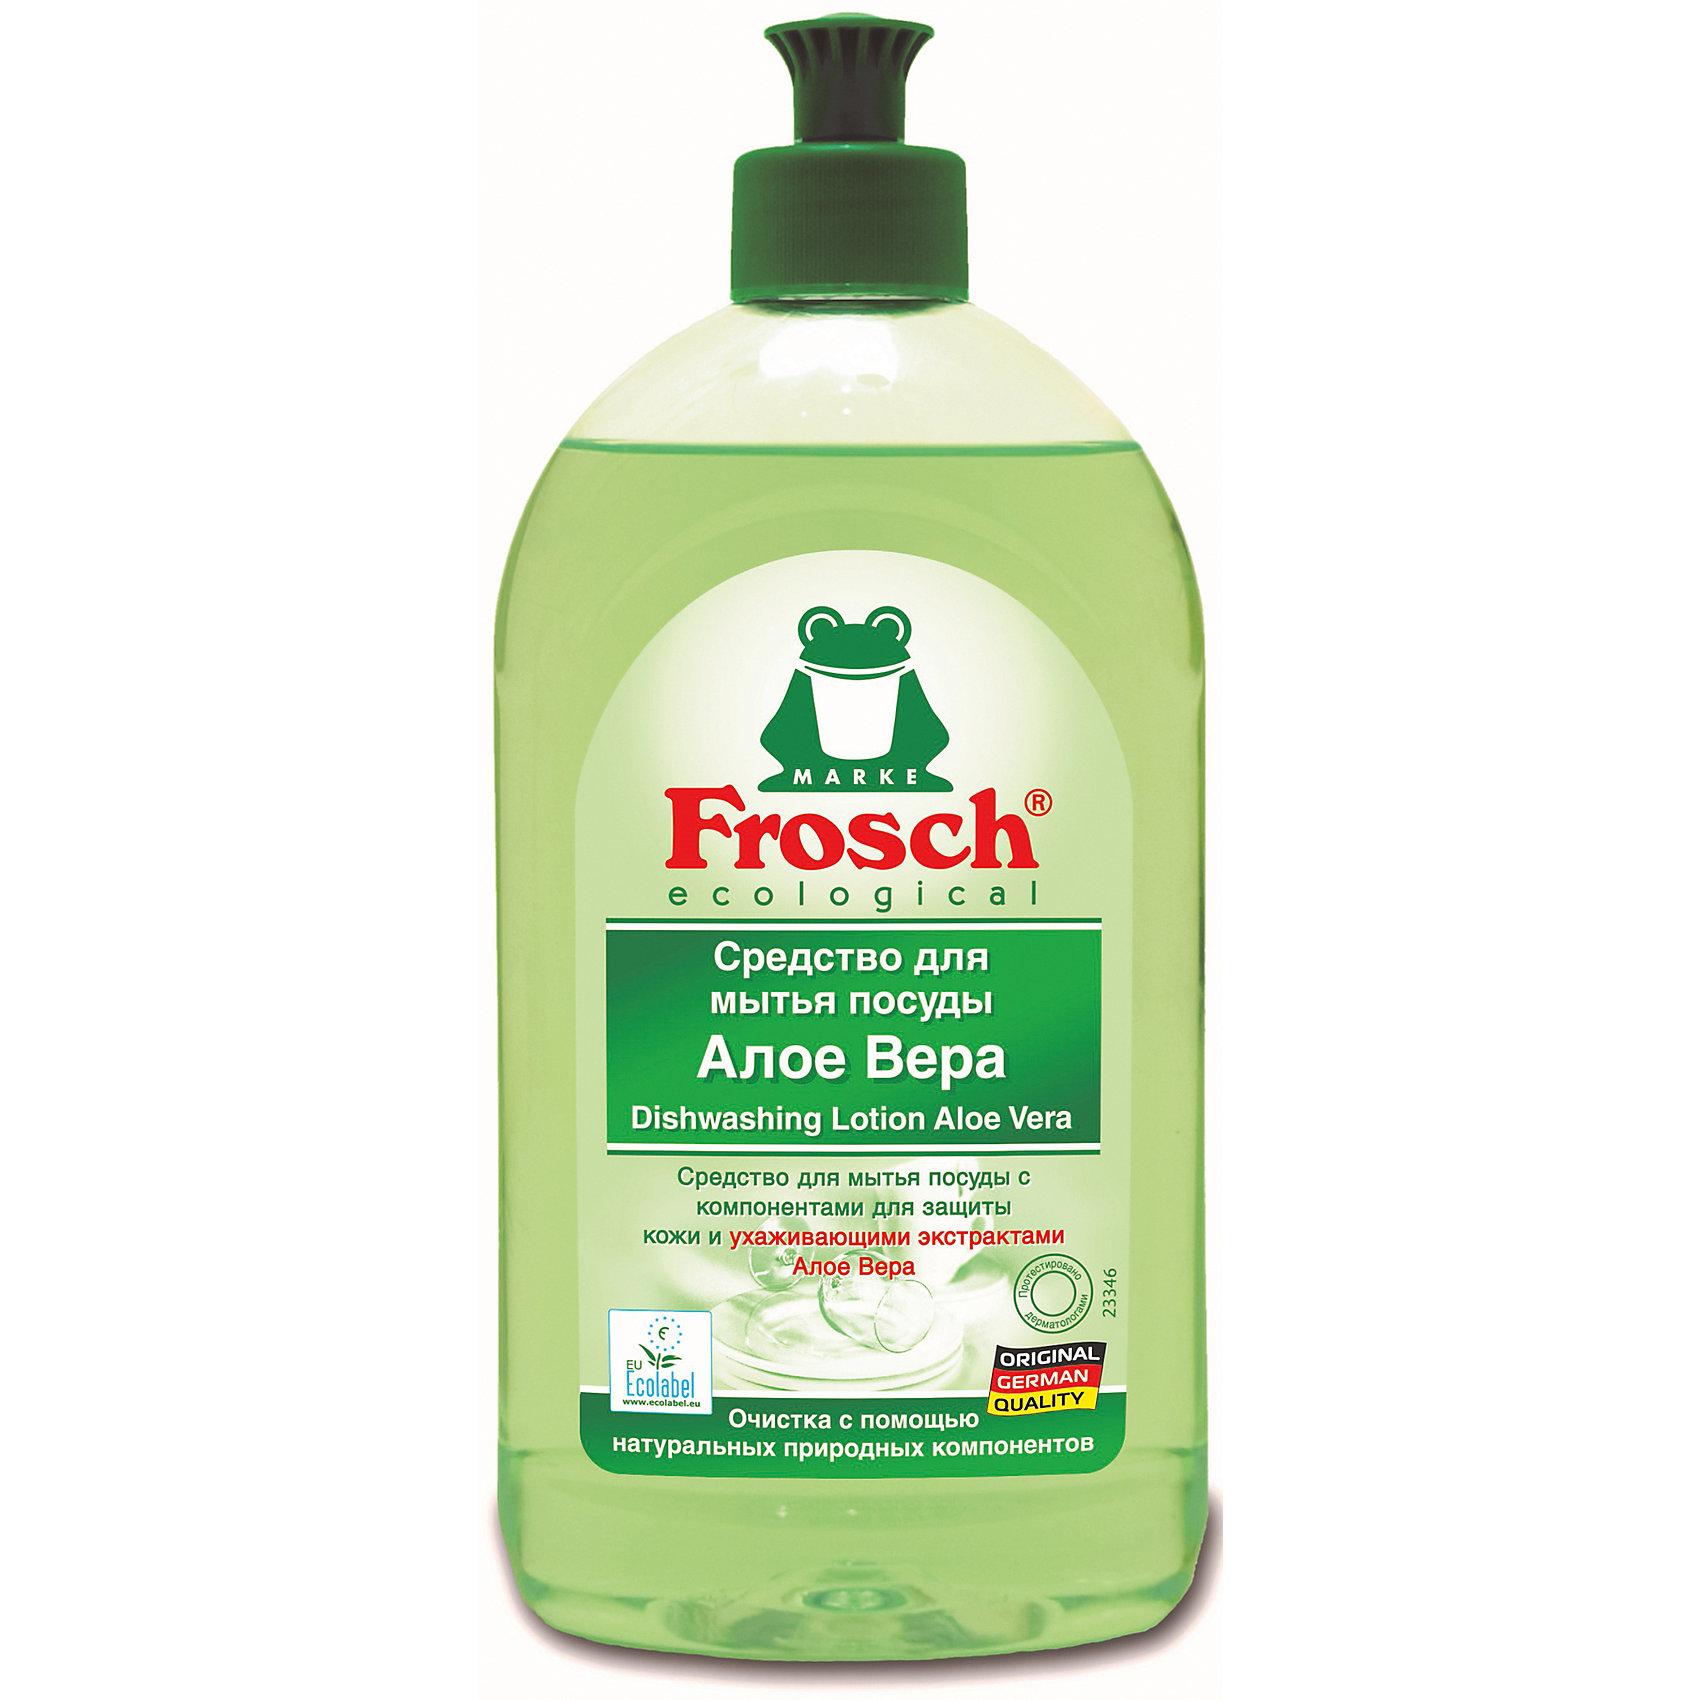 - Средство для мытья посуды Алоэ Вера, 0,5л, Frosch бальзам для мытья посуды зеленый чай frosch 0 5 л